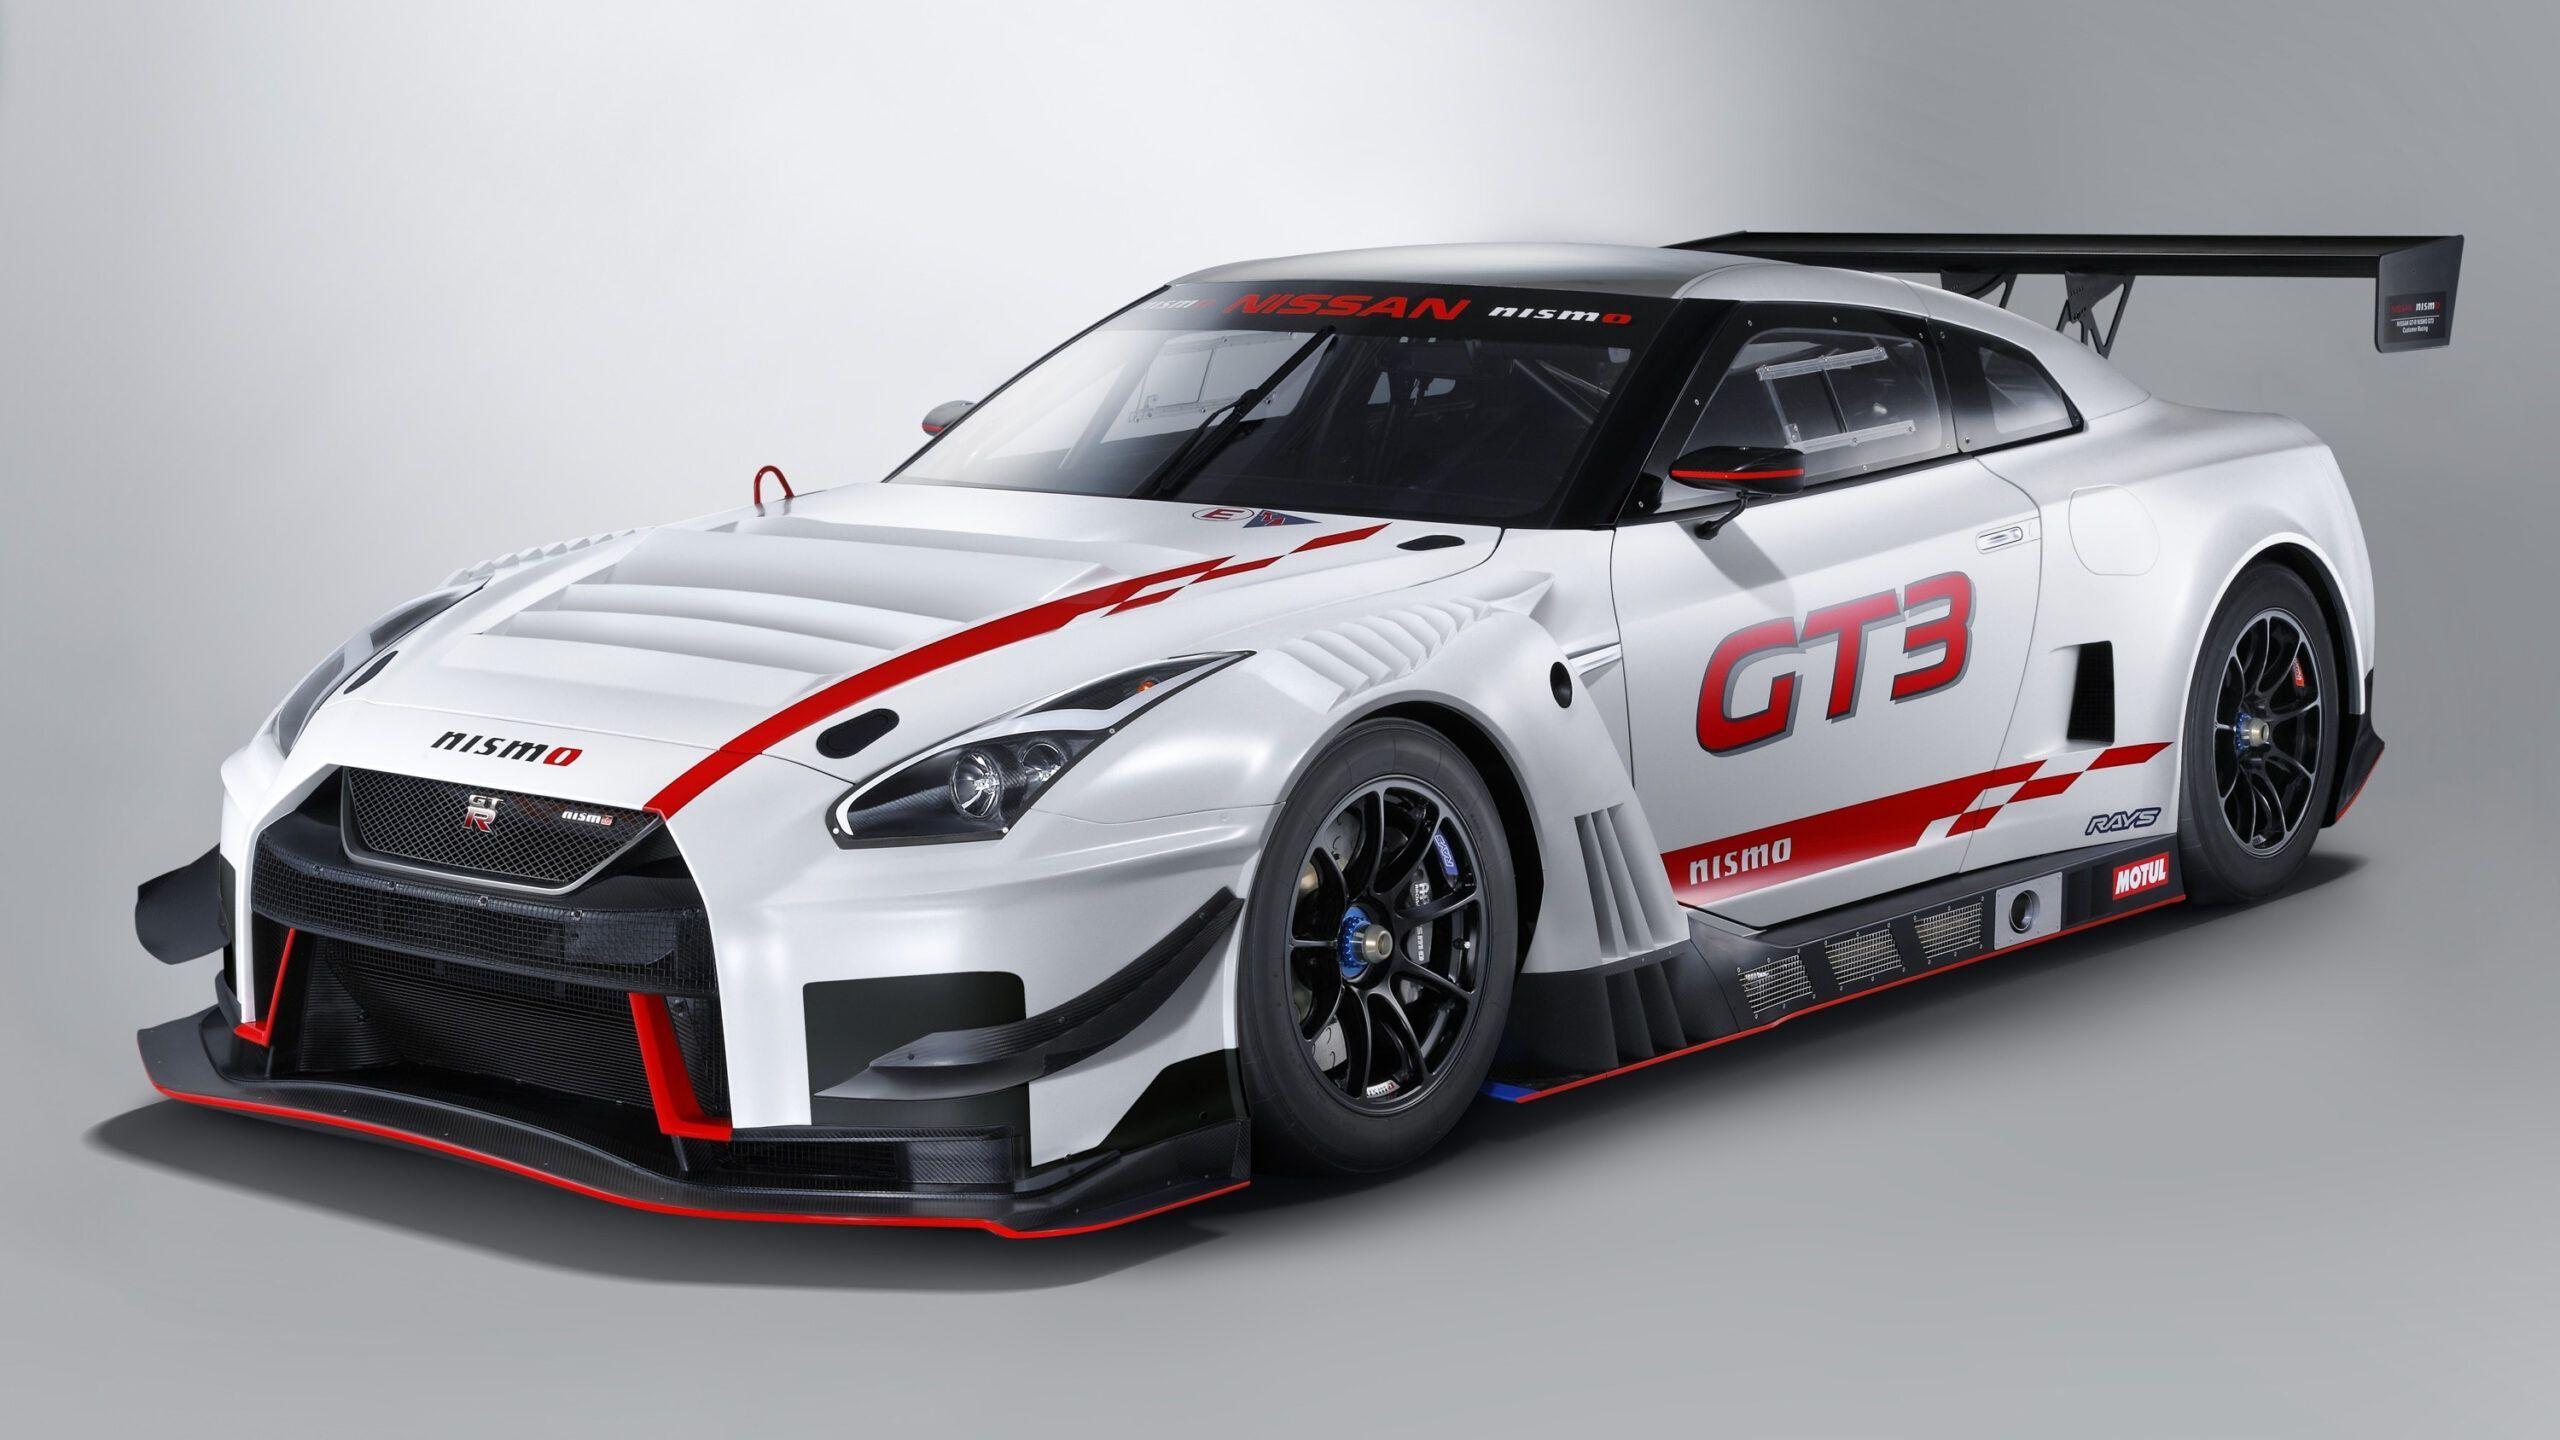 Nissan Gtr 2020 Top Speed First Drive Nissangtr In 2020 Nissan Gtr Nissan Gtr Nismo Nissan Gt